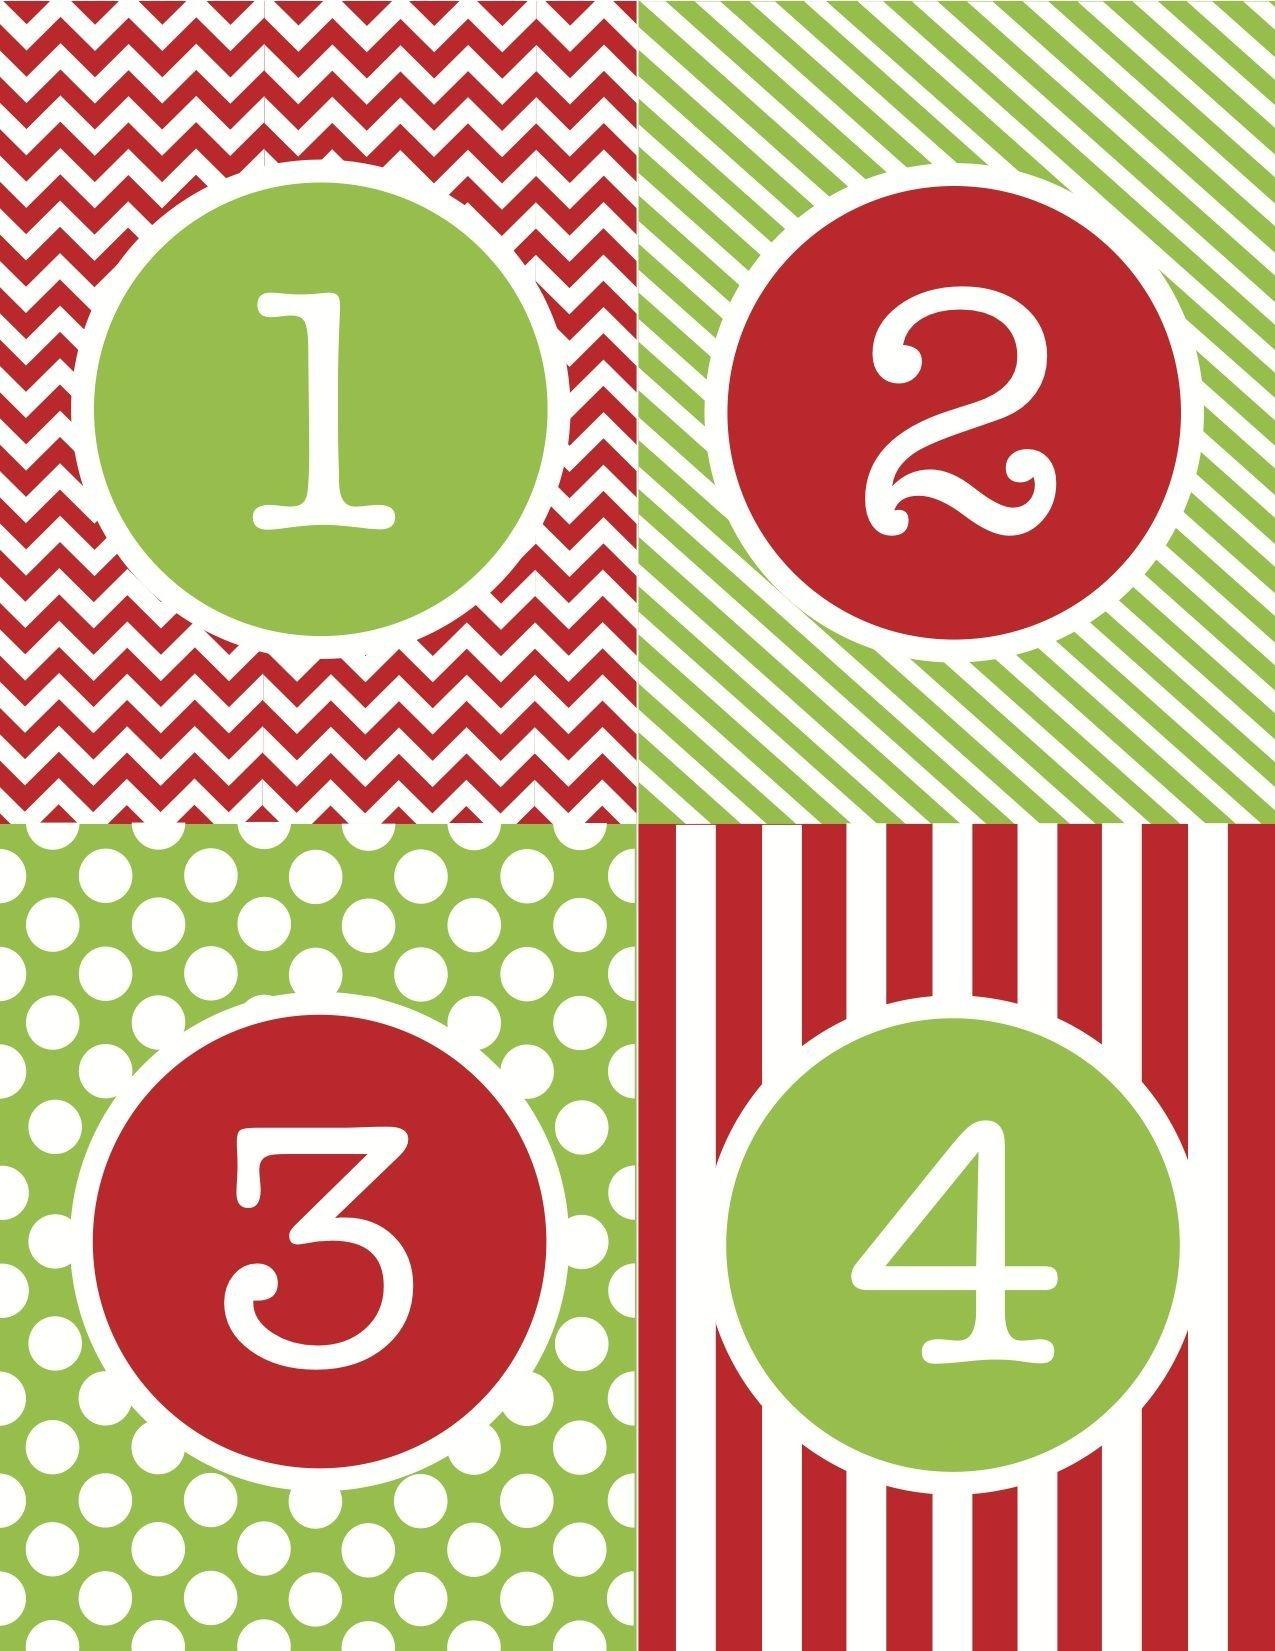 Calendar Numbers 1 31 For Spring : Free Calendar Template Printable Calendar Numbers 1 31 May